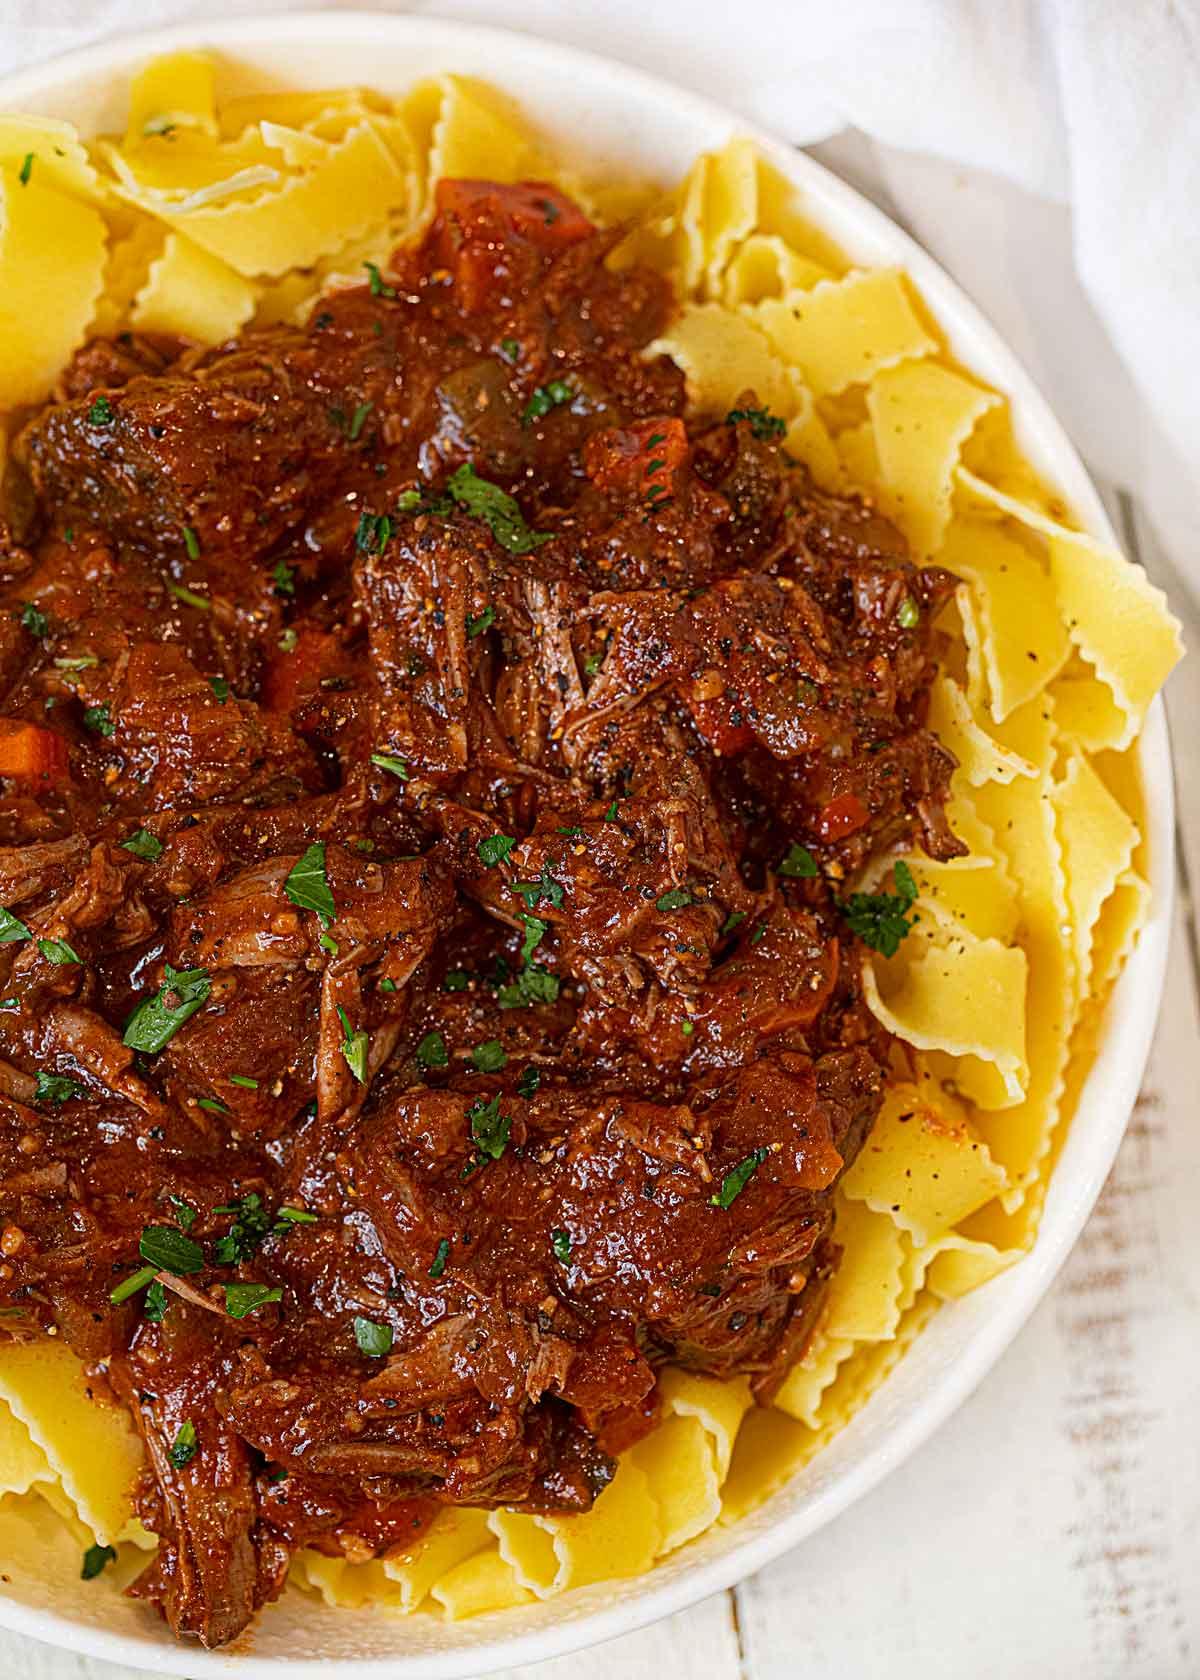 Healthier Beef Ragu over Pasta in white bowl